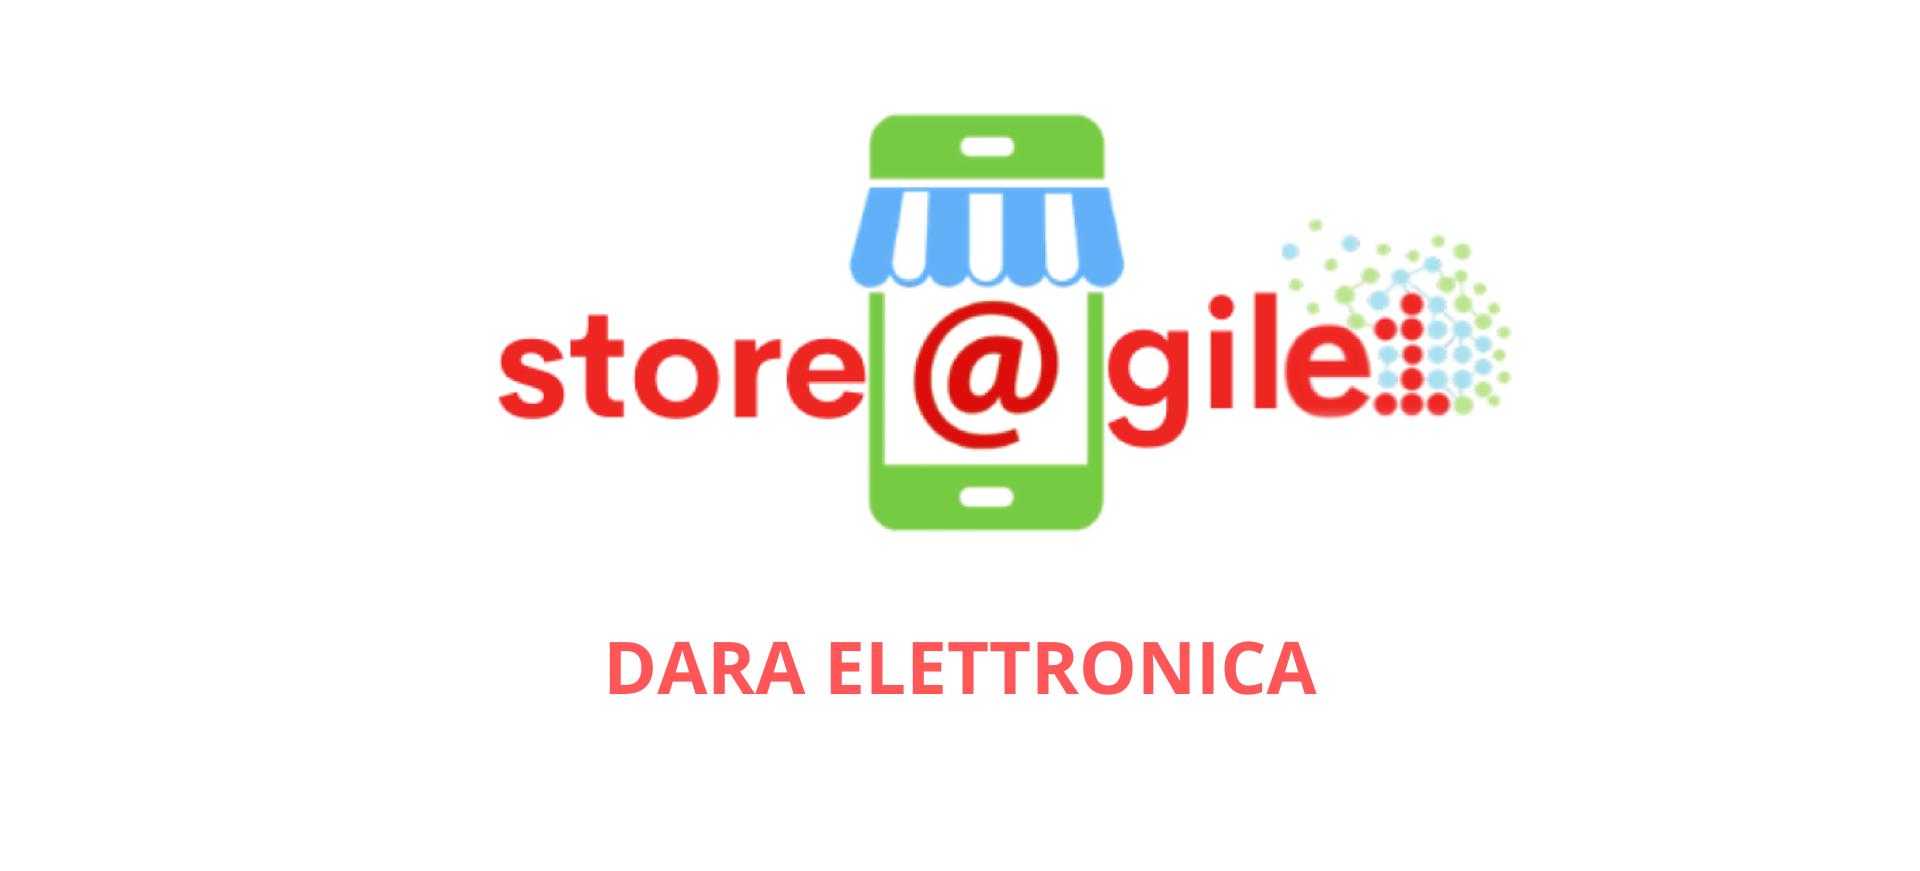 Dara Elettronica